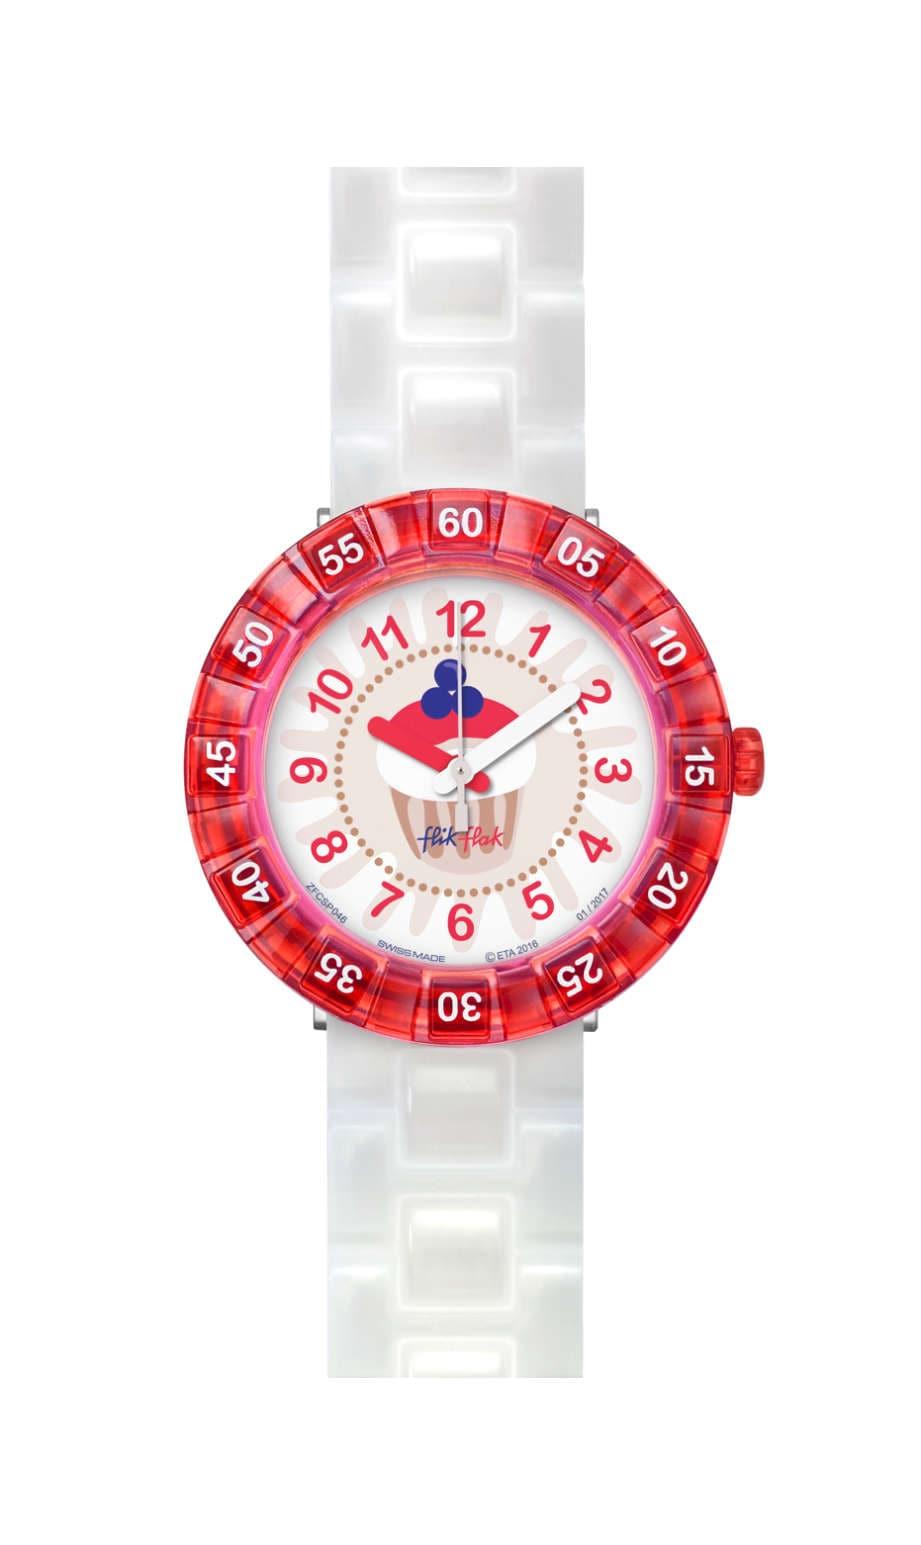 Swatch - MILKITA - 1